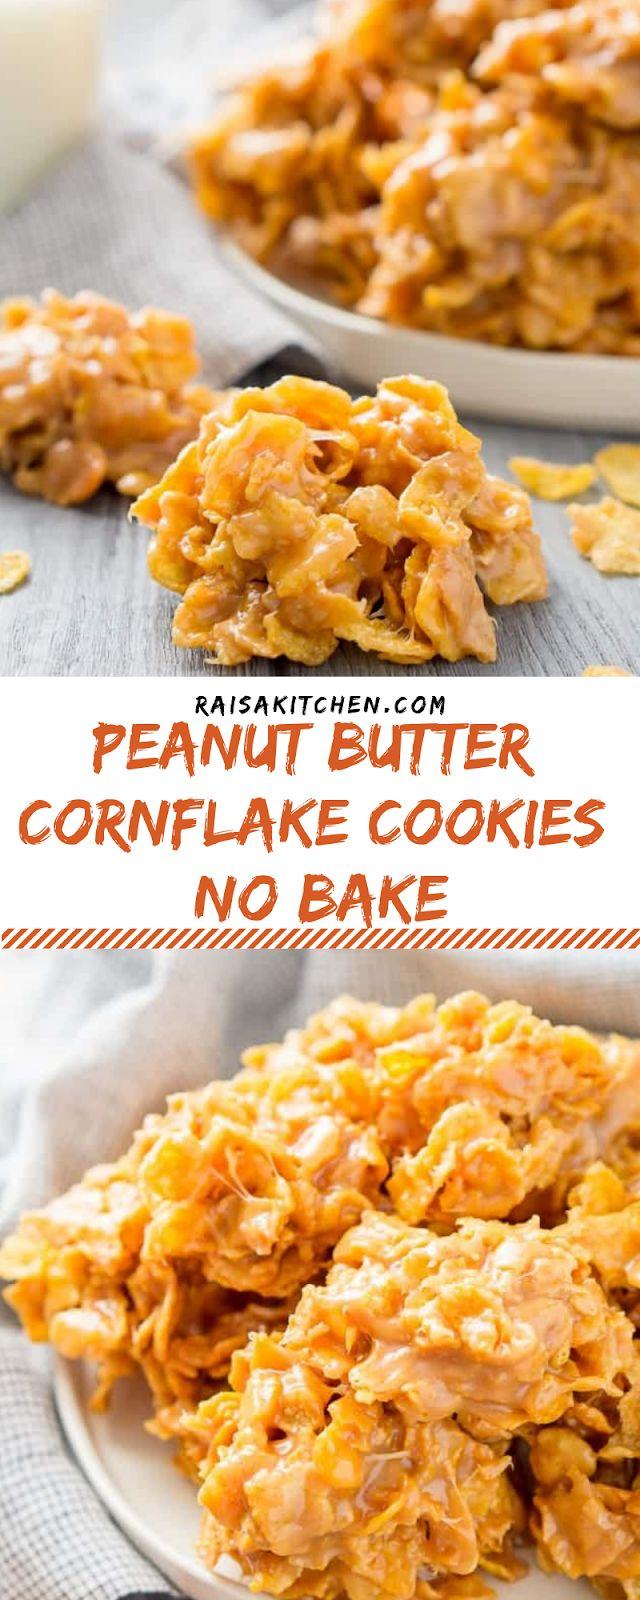 Peanut Butter Cornflake Cookies (no bake